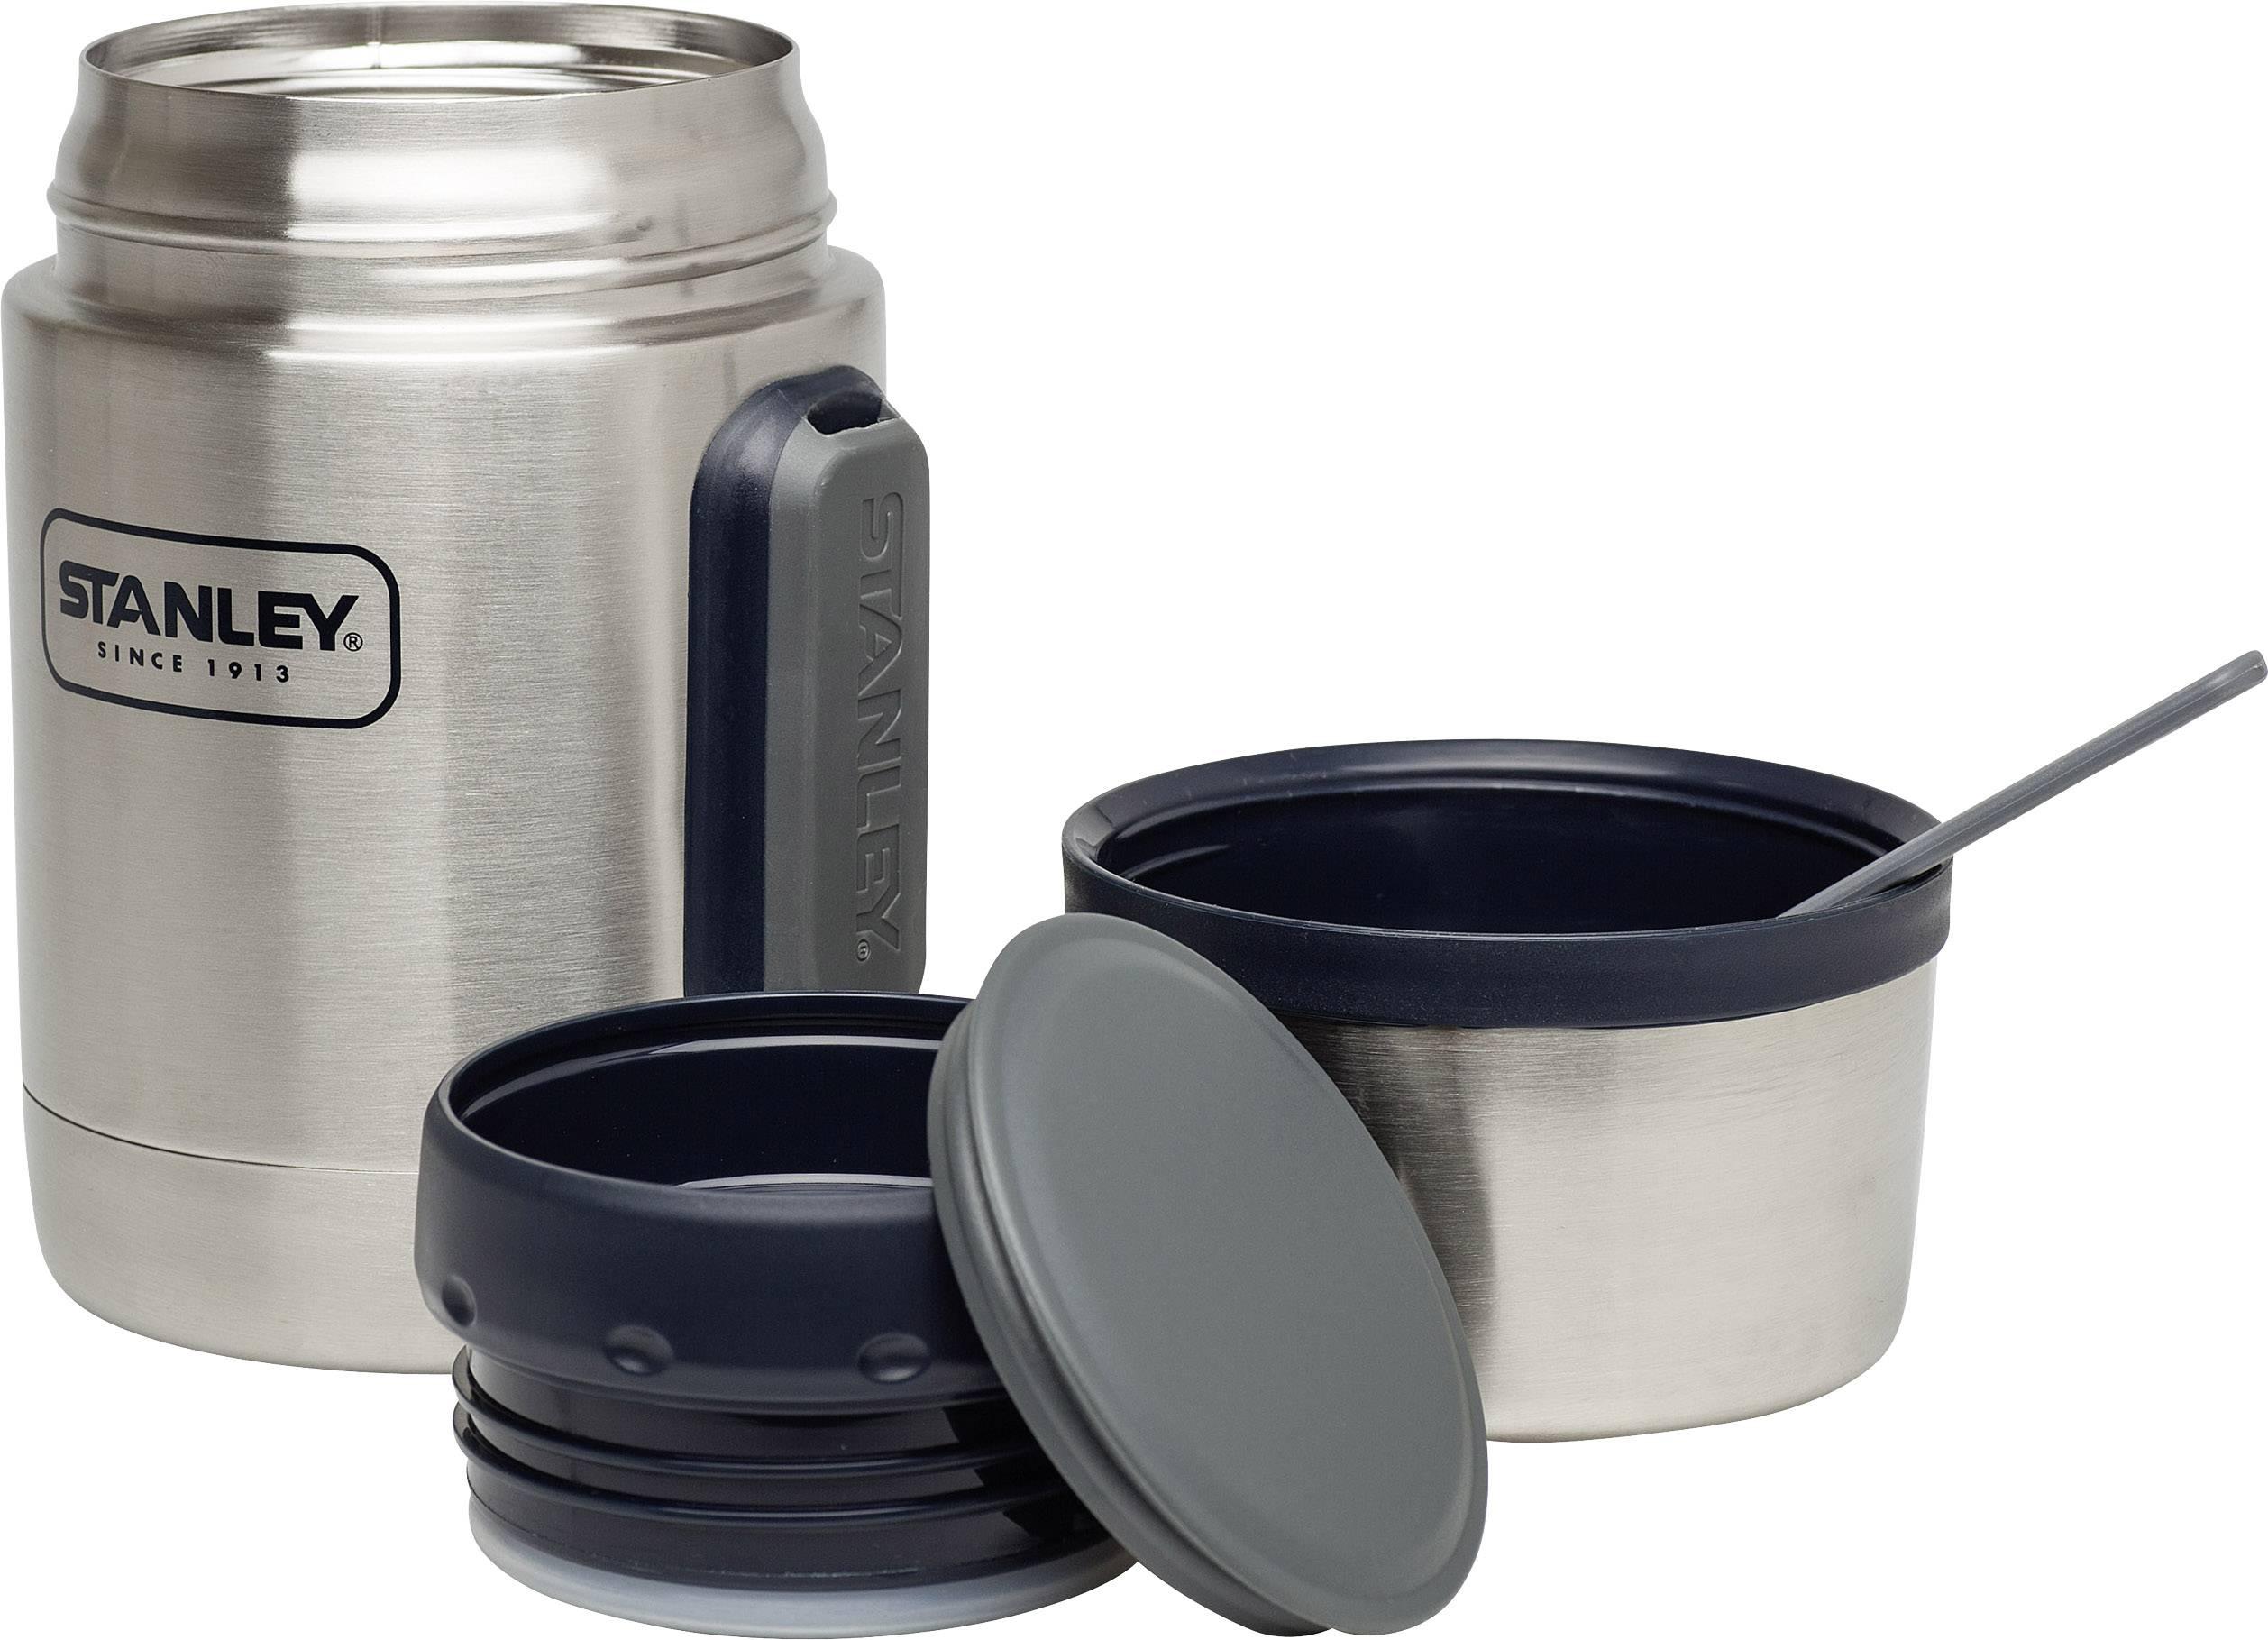 Kempingové nádoby na potraviny Stanley Adventure Food 500 ml 10-01287-021